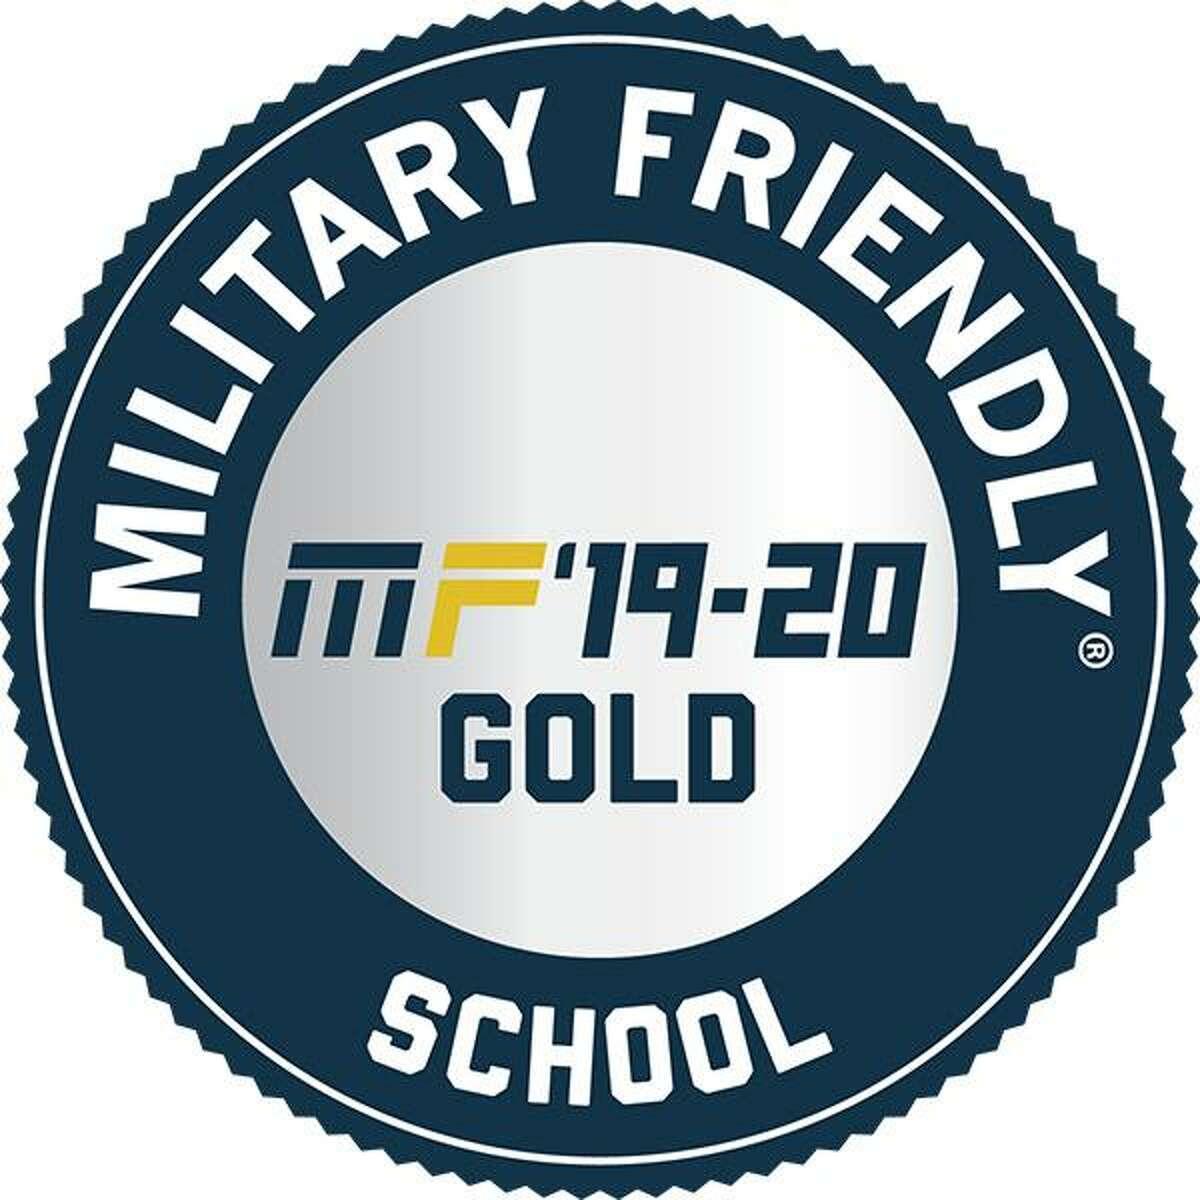 Military Friendly School award for 2019-2020